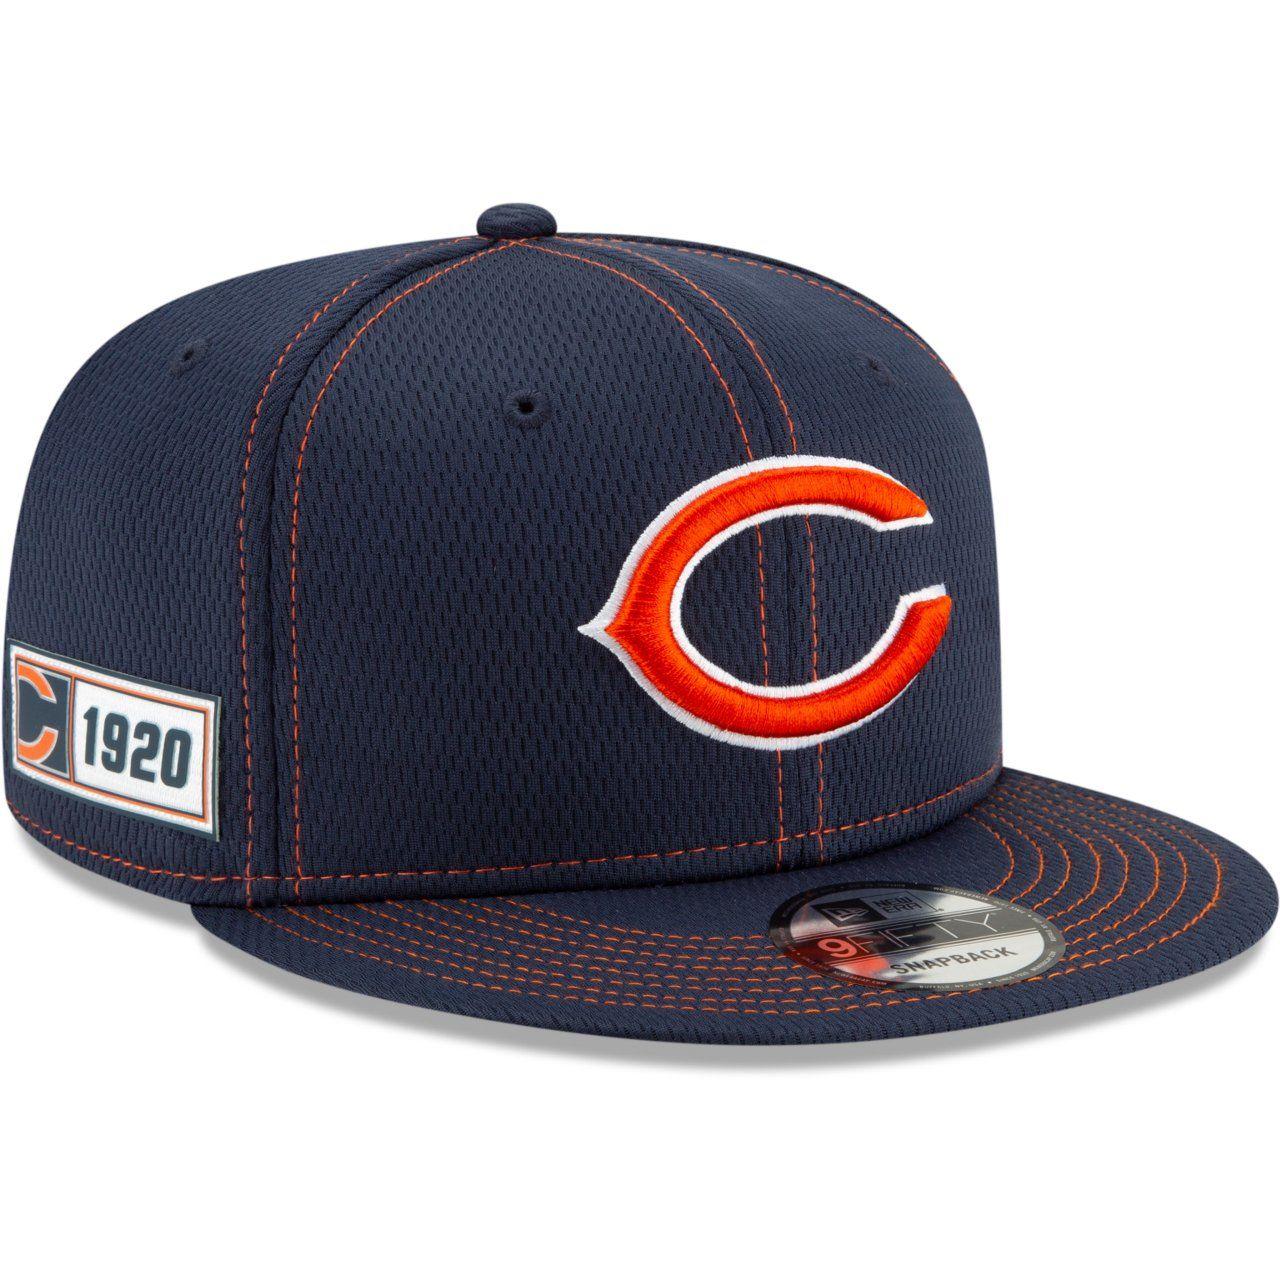 amfoo - New Era 9Fifty Sideline Snapback Cap - Chicago Bears 1920